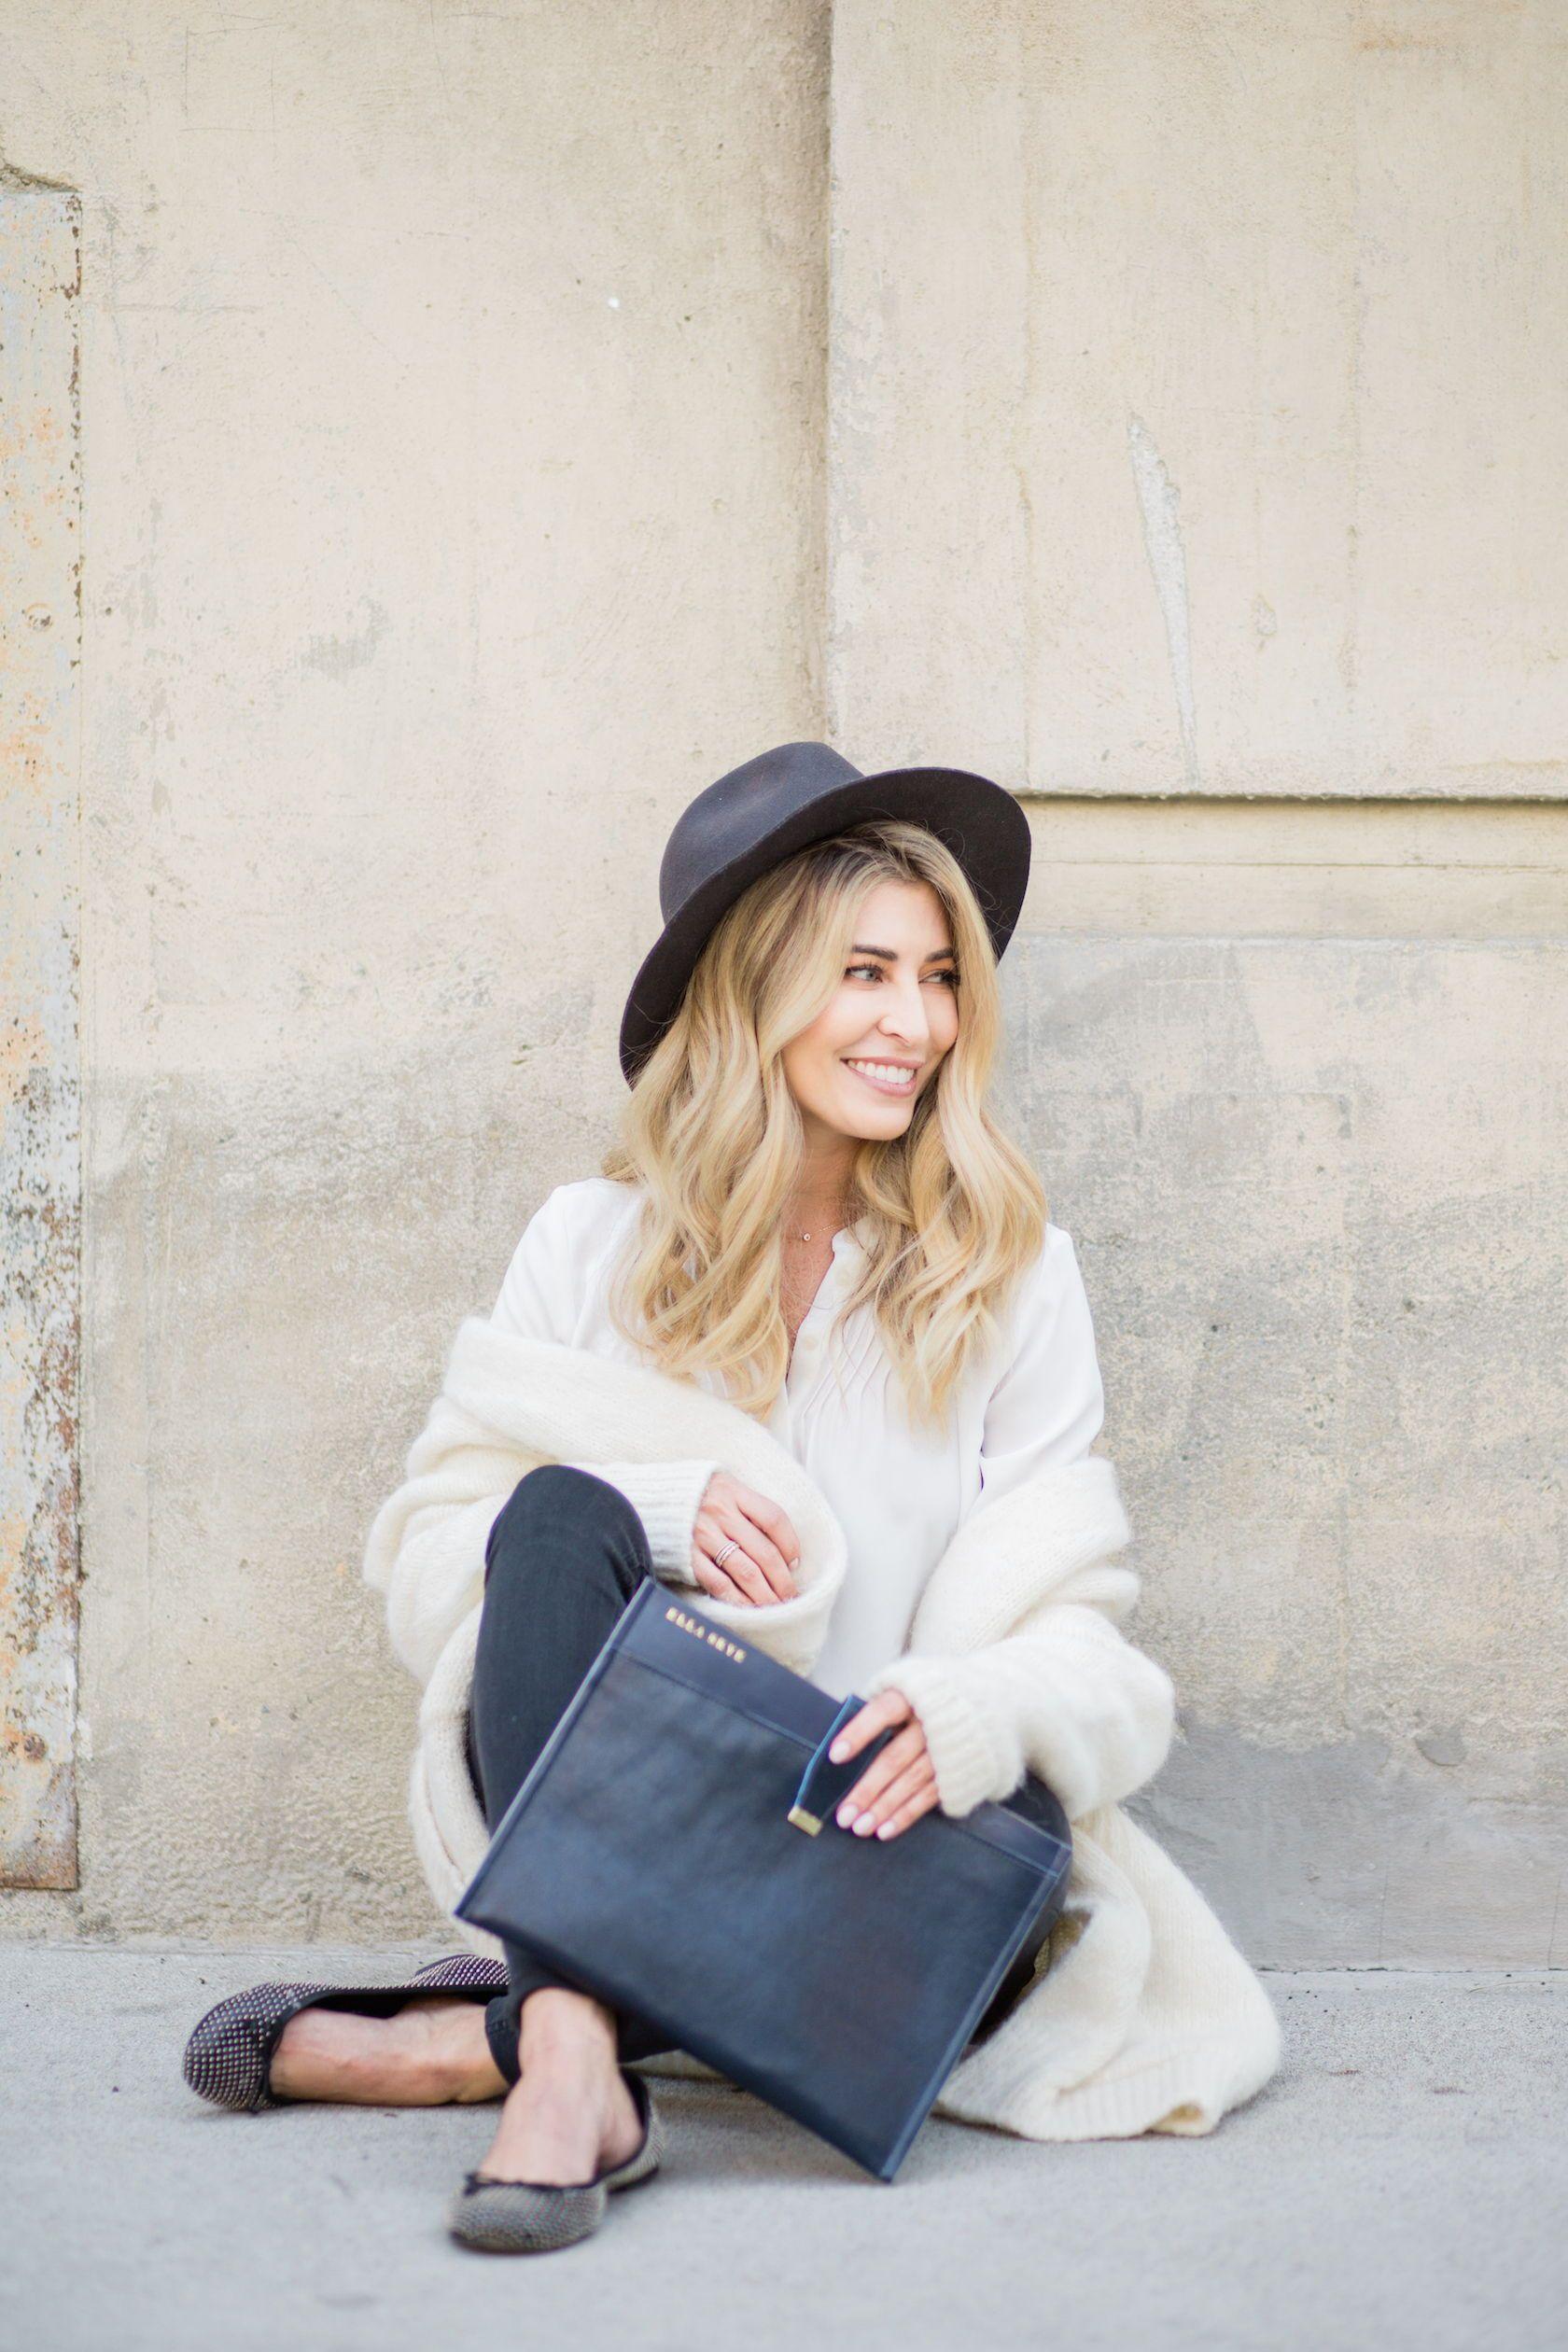 Modern brand photos for tech accessories brand Elle Skye